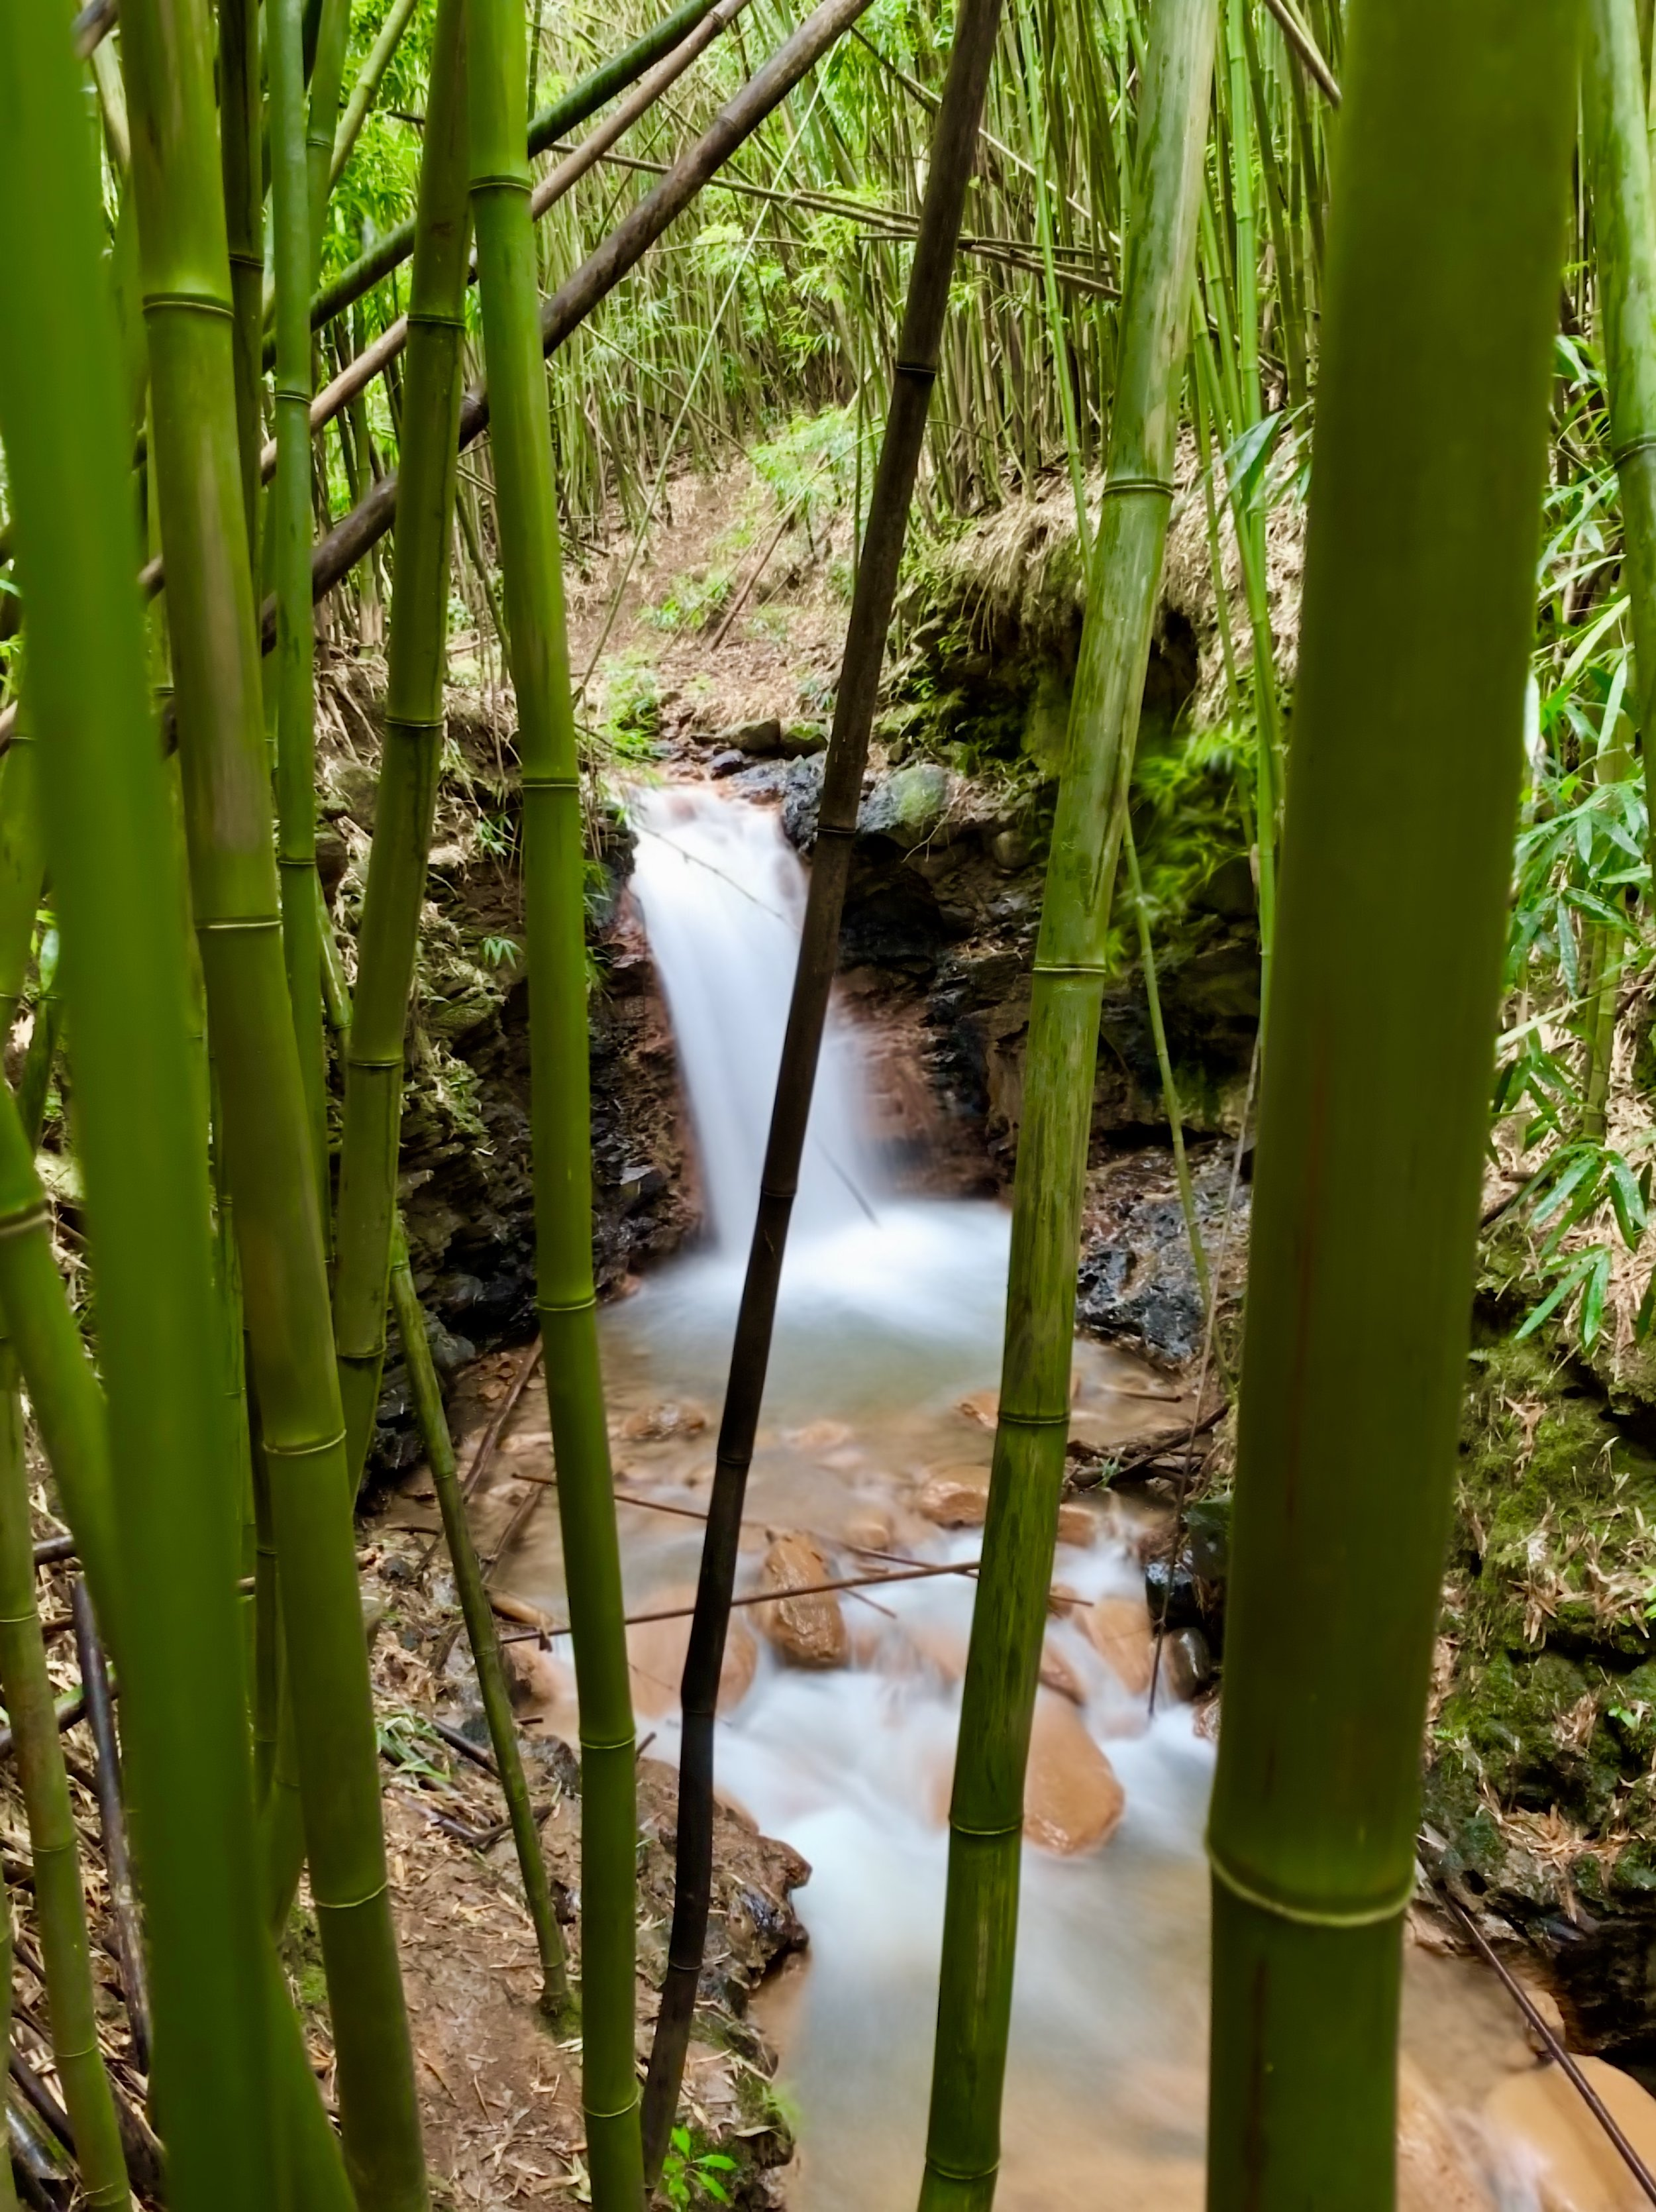 Blue_Soul_Maui_Private_Tour_Hana_Waterfall_4.jpg